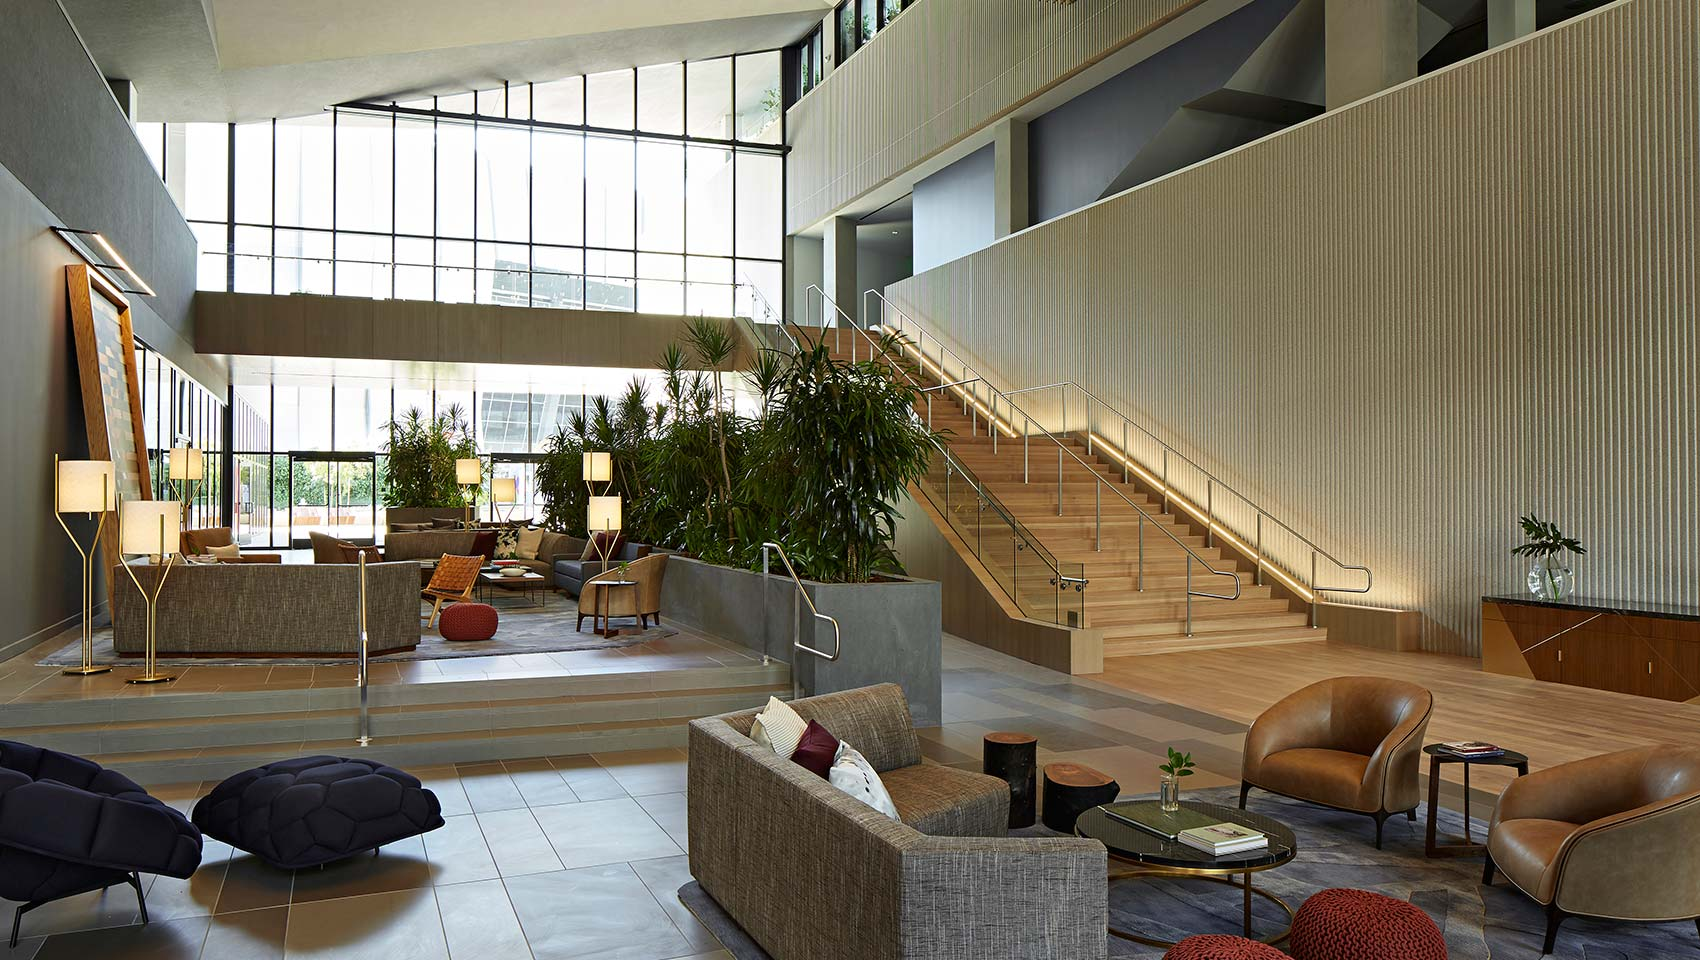 The lobby of the Sawyer Hotel, Sacramento